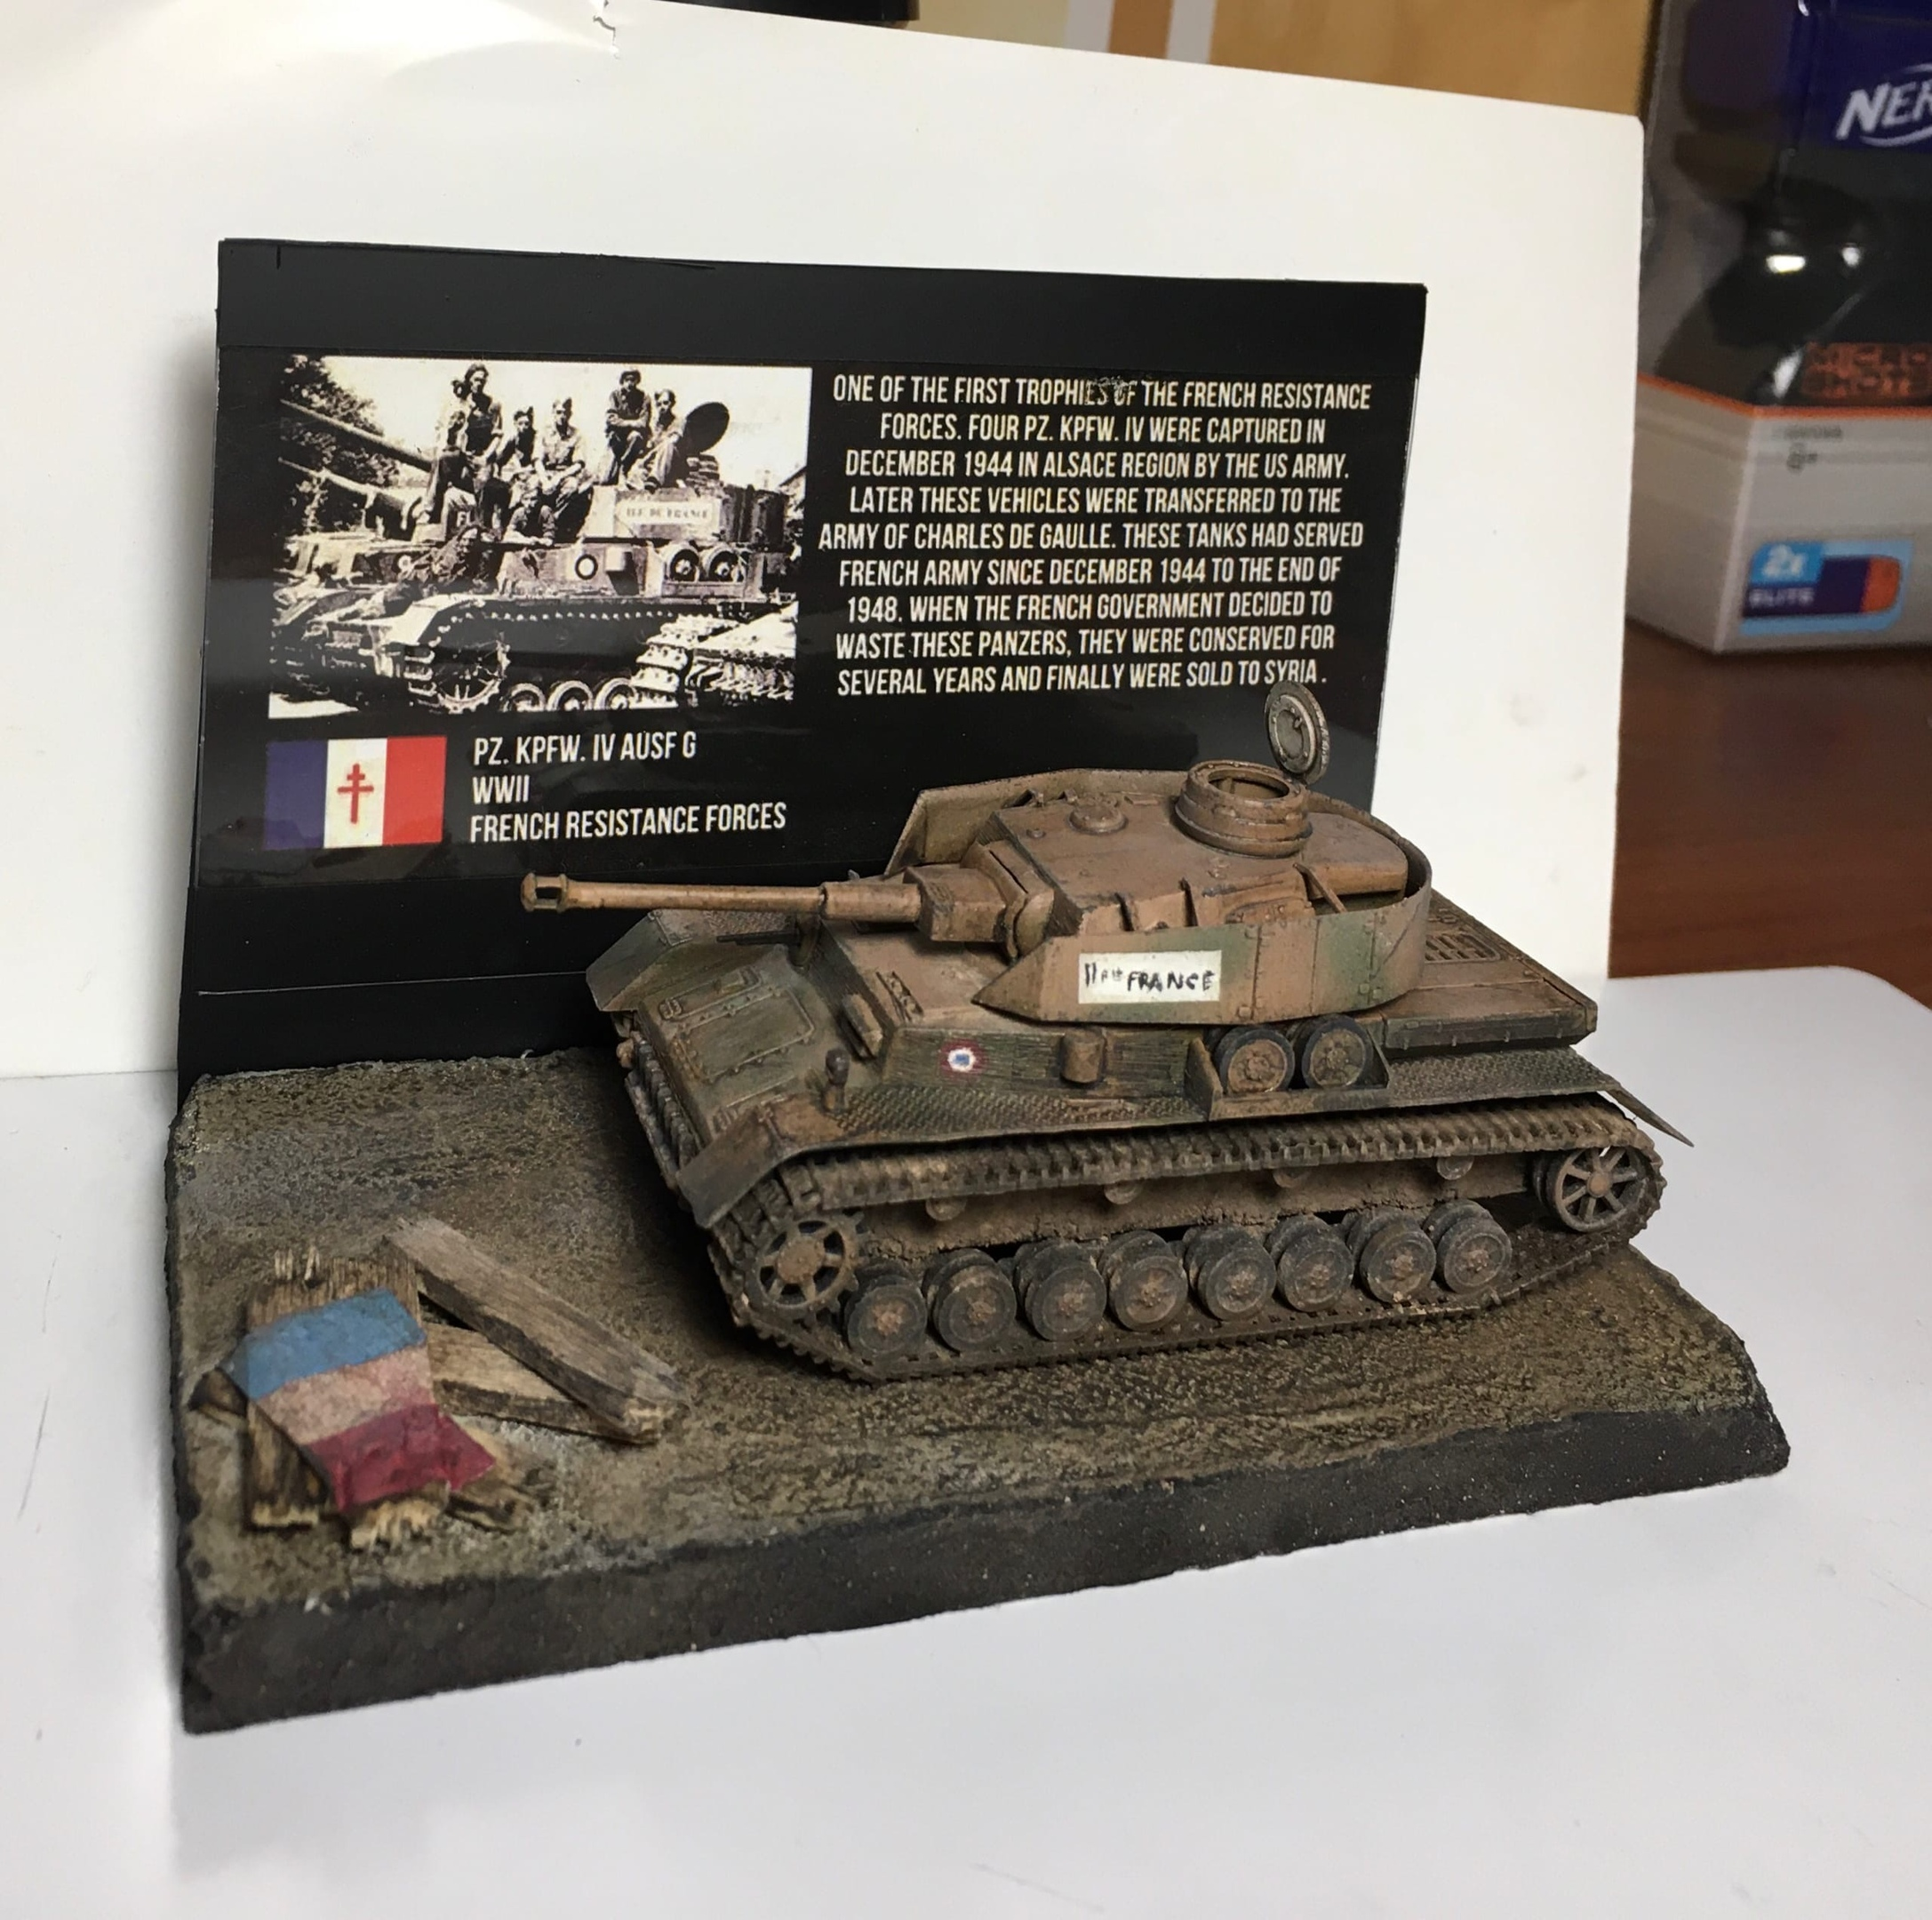 Pz. kpfw. IV French Resistance